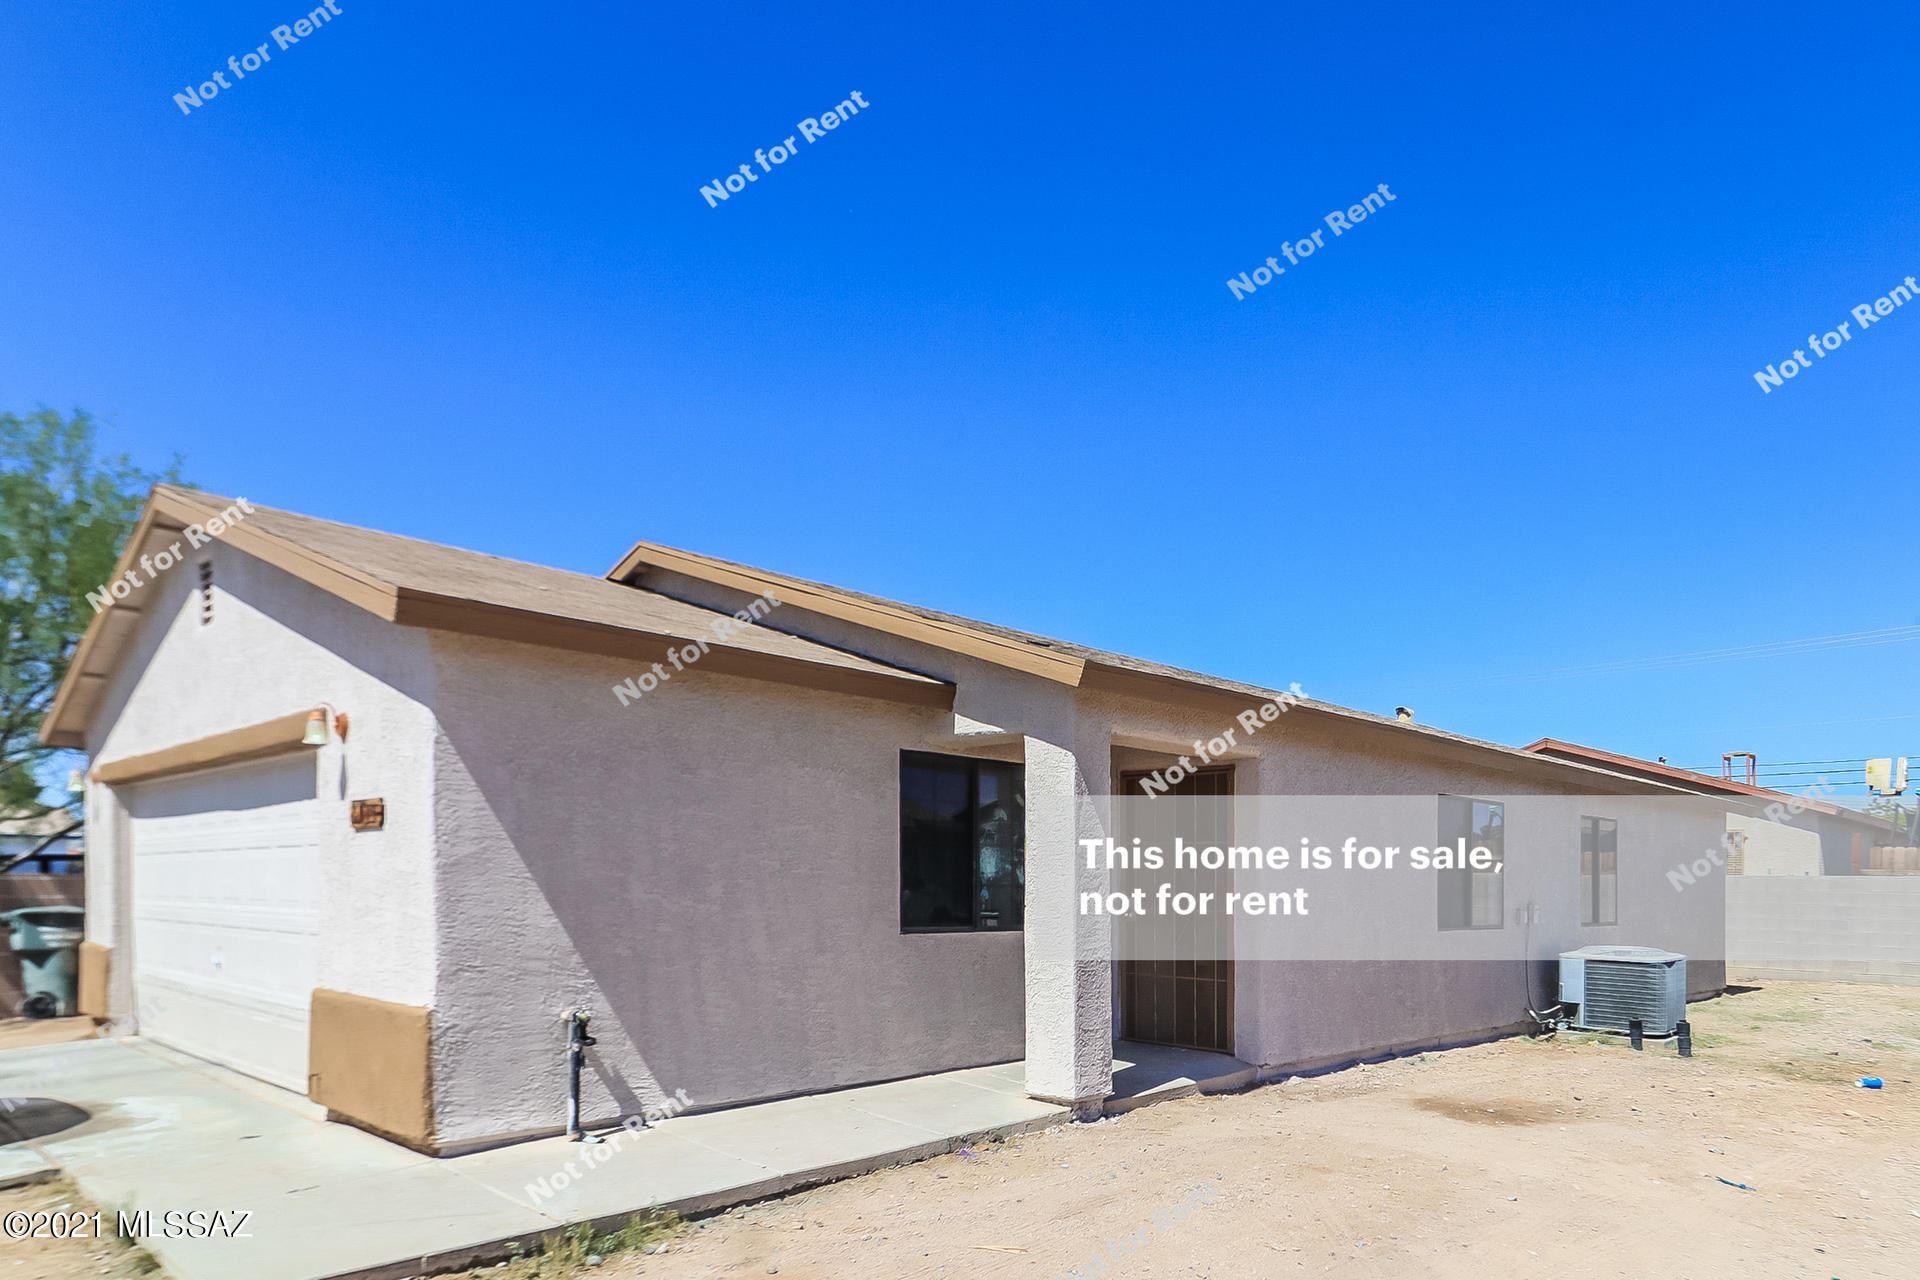 5335 Fairland Park Lane, Tucson, AZ 85706 - MLS#: 22114045